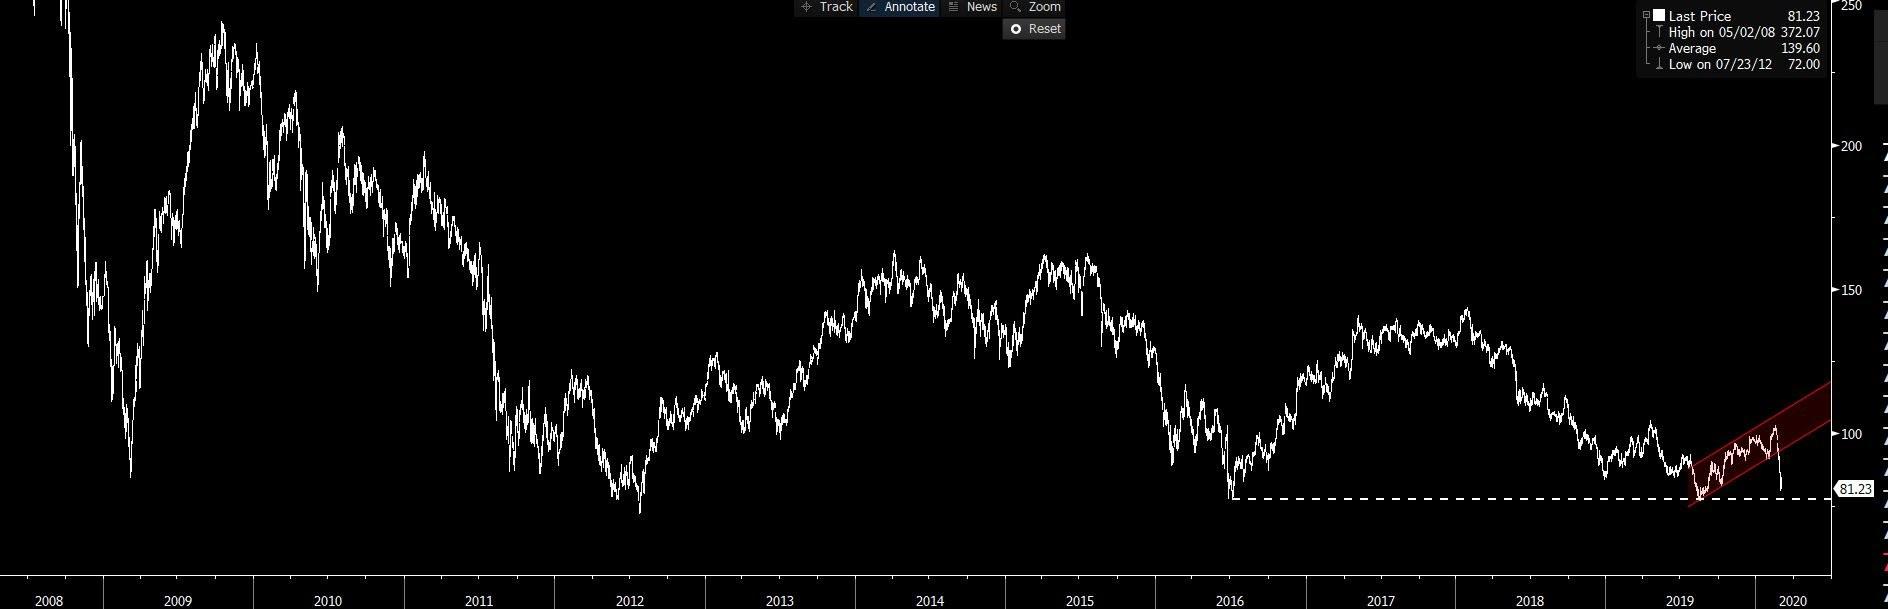 EU STOXX banking index chart